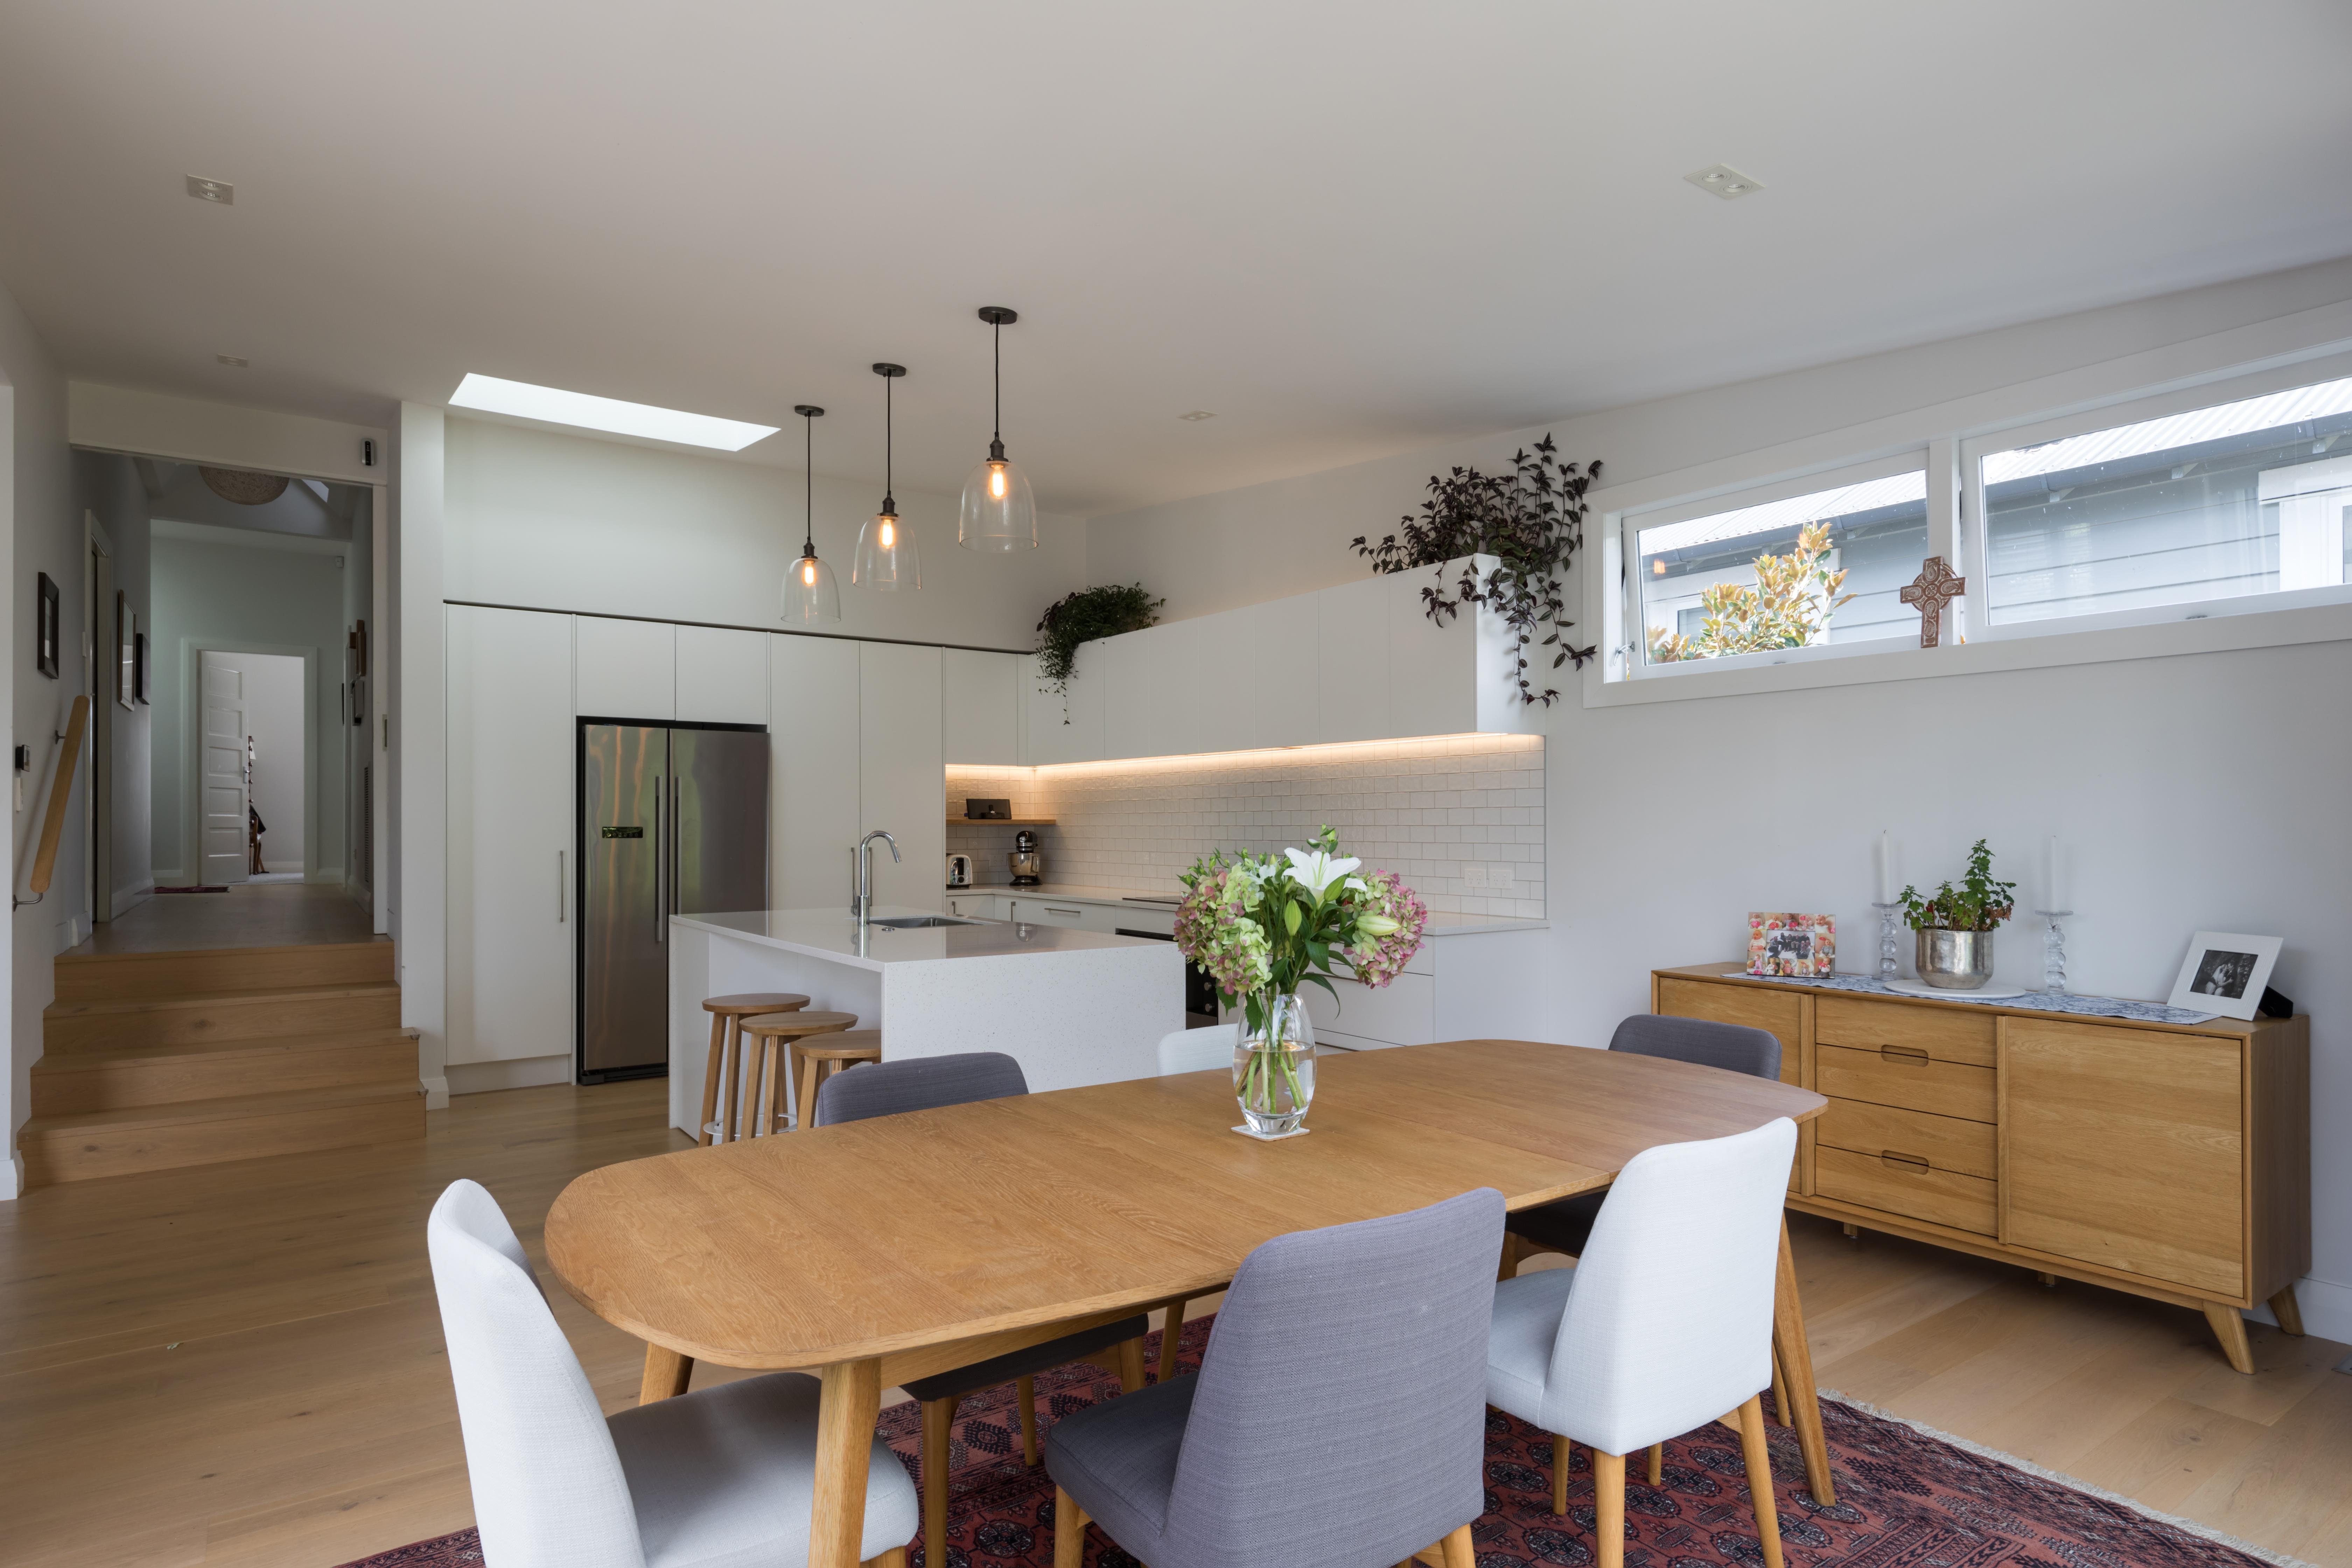 contemporary bungalow kitchen extension